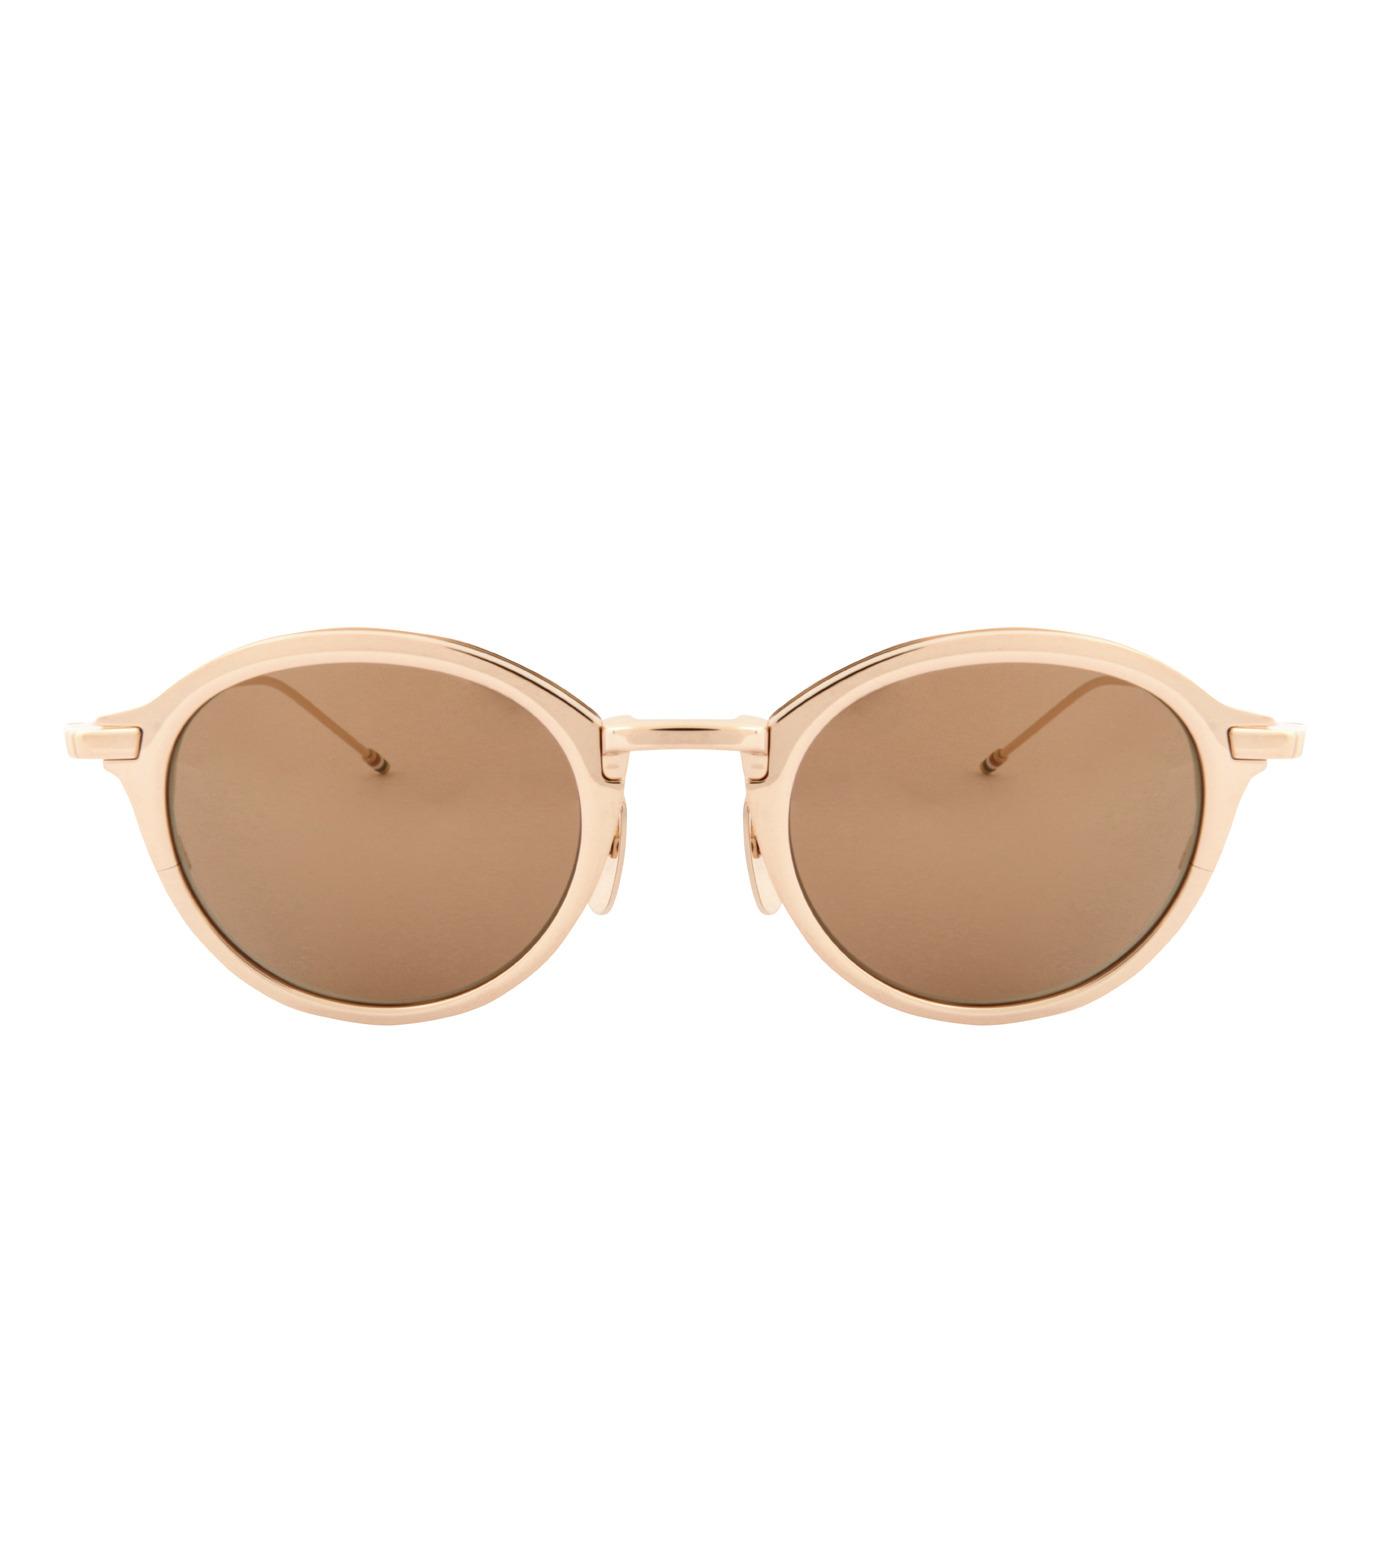 Thom Browne Eye Wear(トム・ブラウン・アイウェア)のRound Lens-GOLD(アイウェア/eyewear)-TB-110-C-T-2 拡大詳細画像3